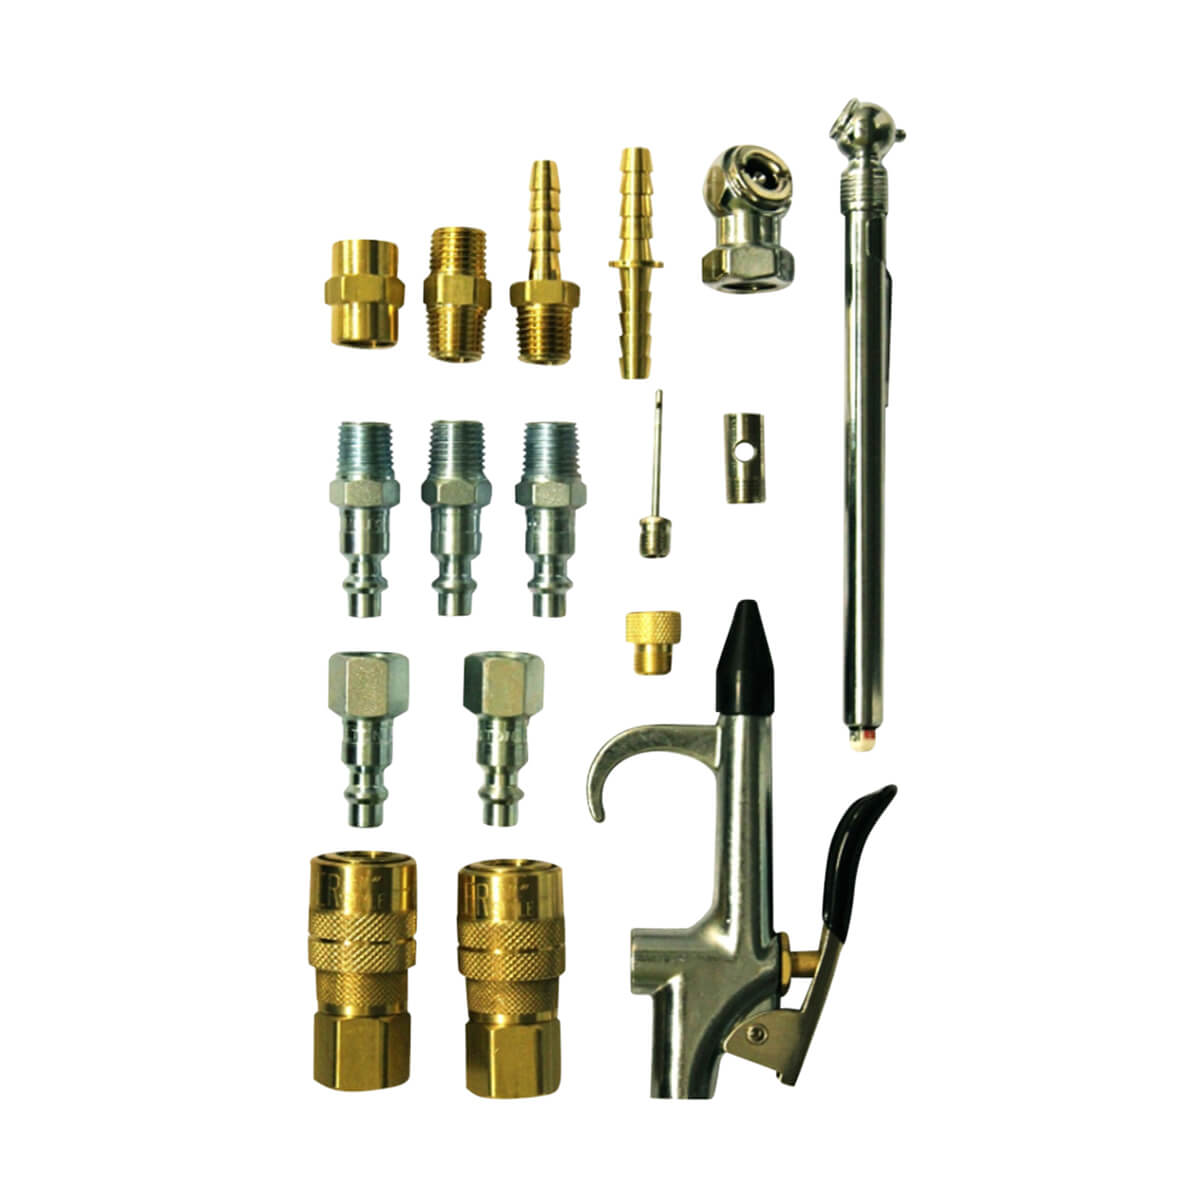 M Style Compressor Starter Kit - 16 Piece